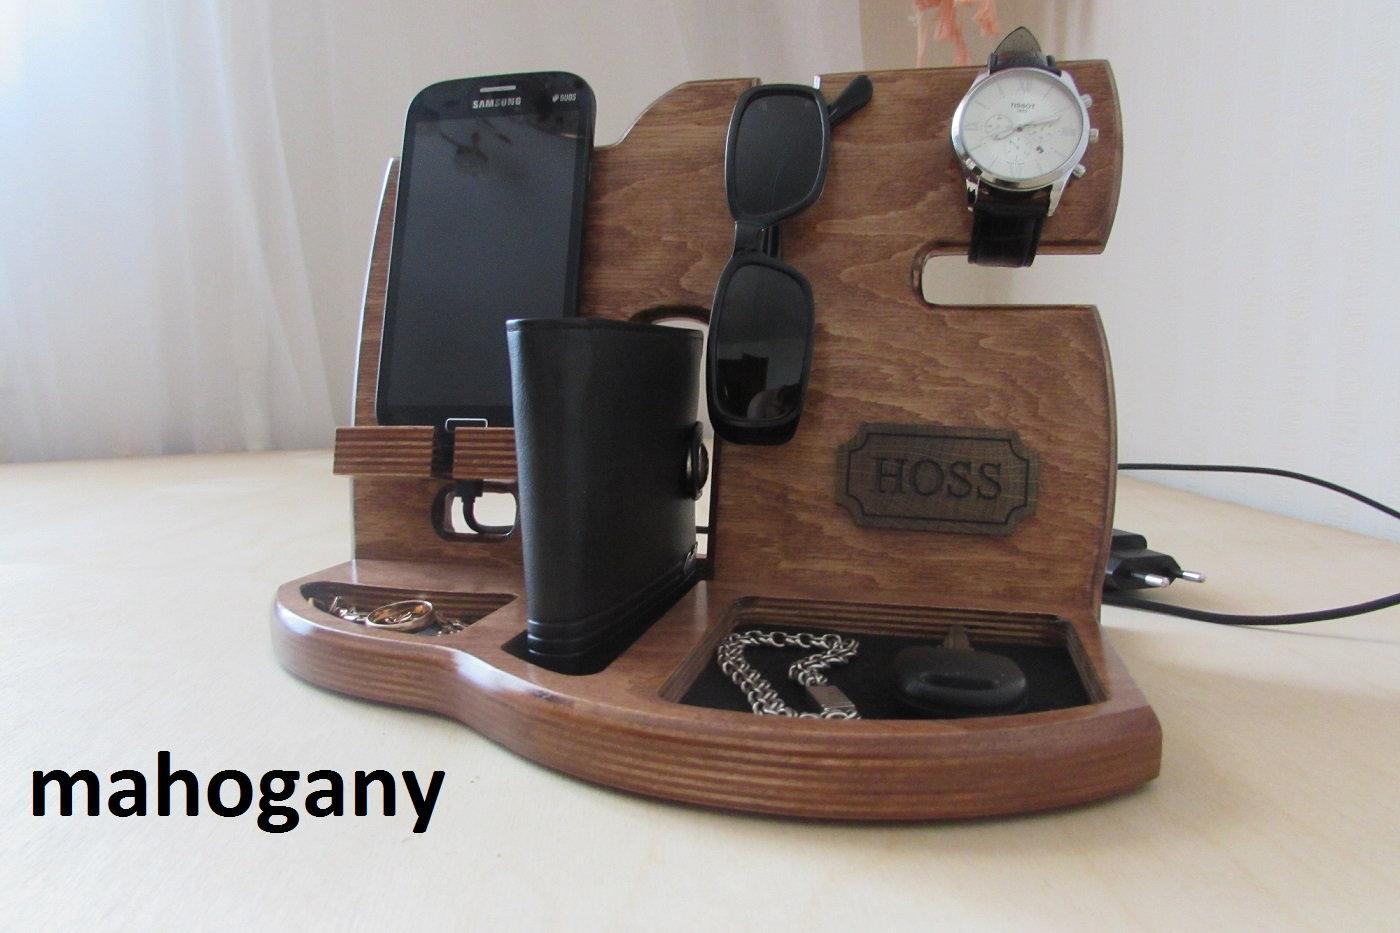 Wood Organizer Docking Station Anniversary Gift Men Nightstand Organizer Glasses Holder Charging Dock Wooden Phone Stand Husband Gift Mens